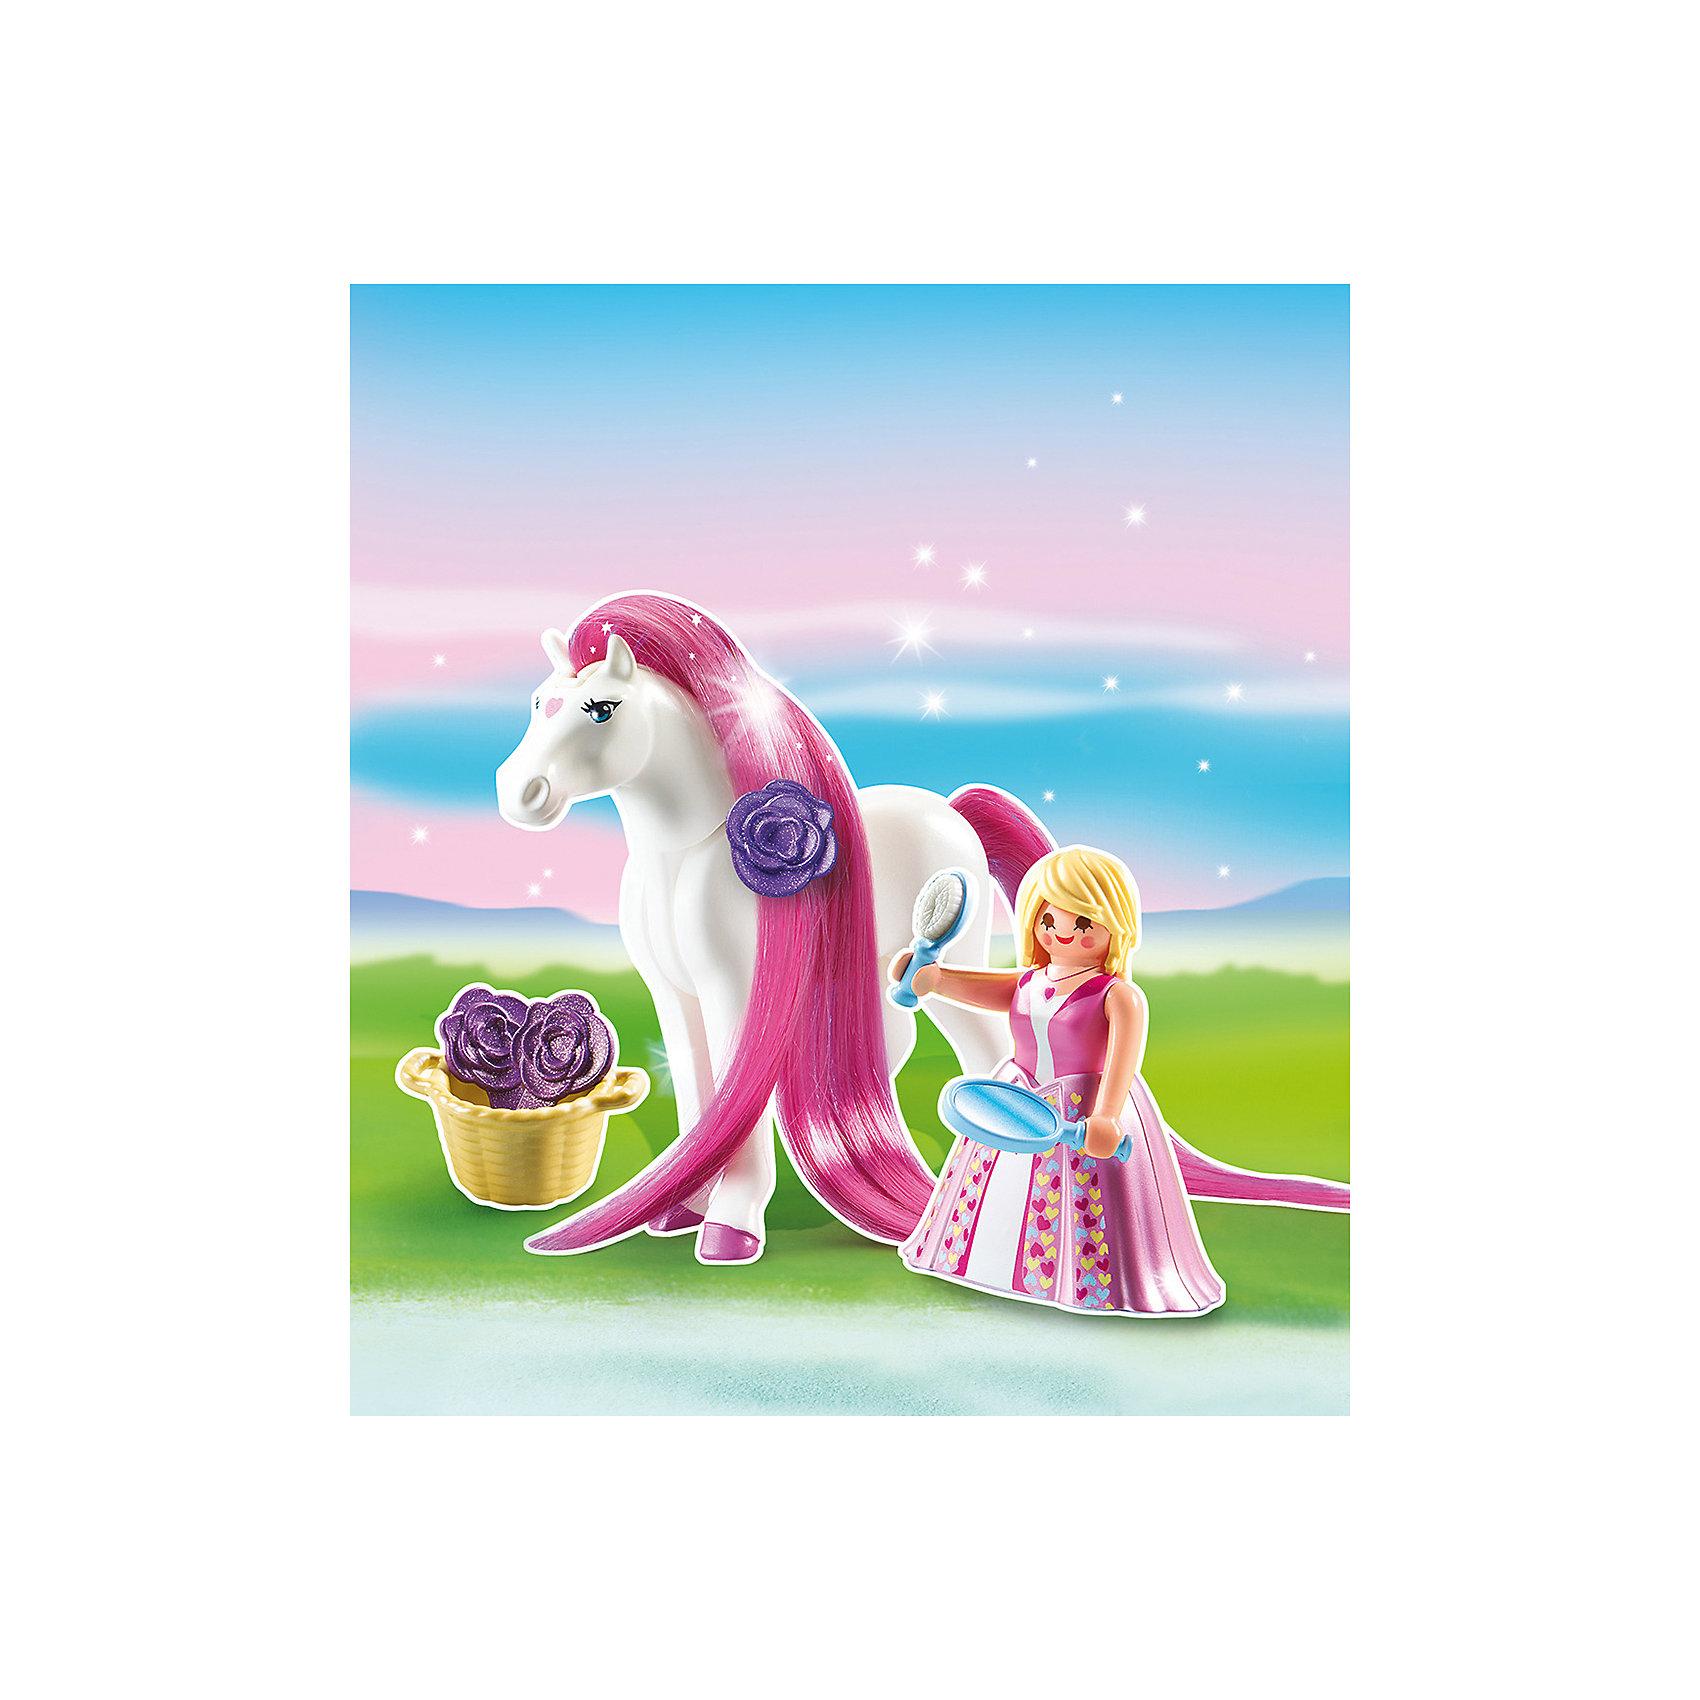 PLAYMOBIL® Принцессы: Принцесса Розали с Лошадкой, PLAYMOBIL playmobil® playmobil 5546 парк развлечений продавец шаров smileyworld